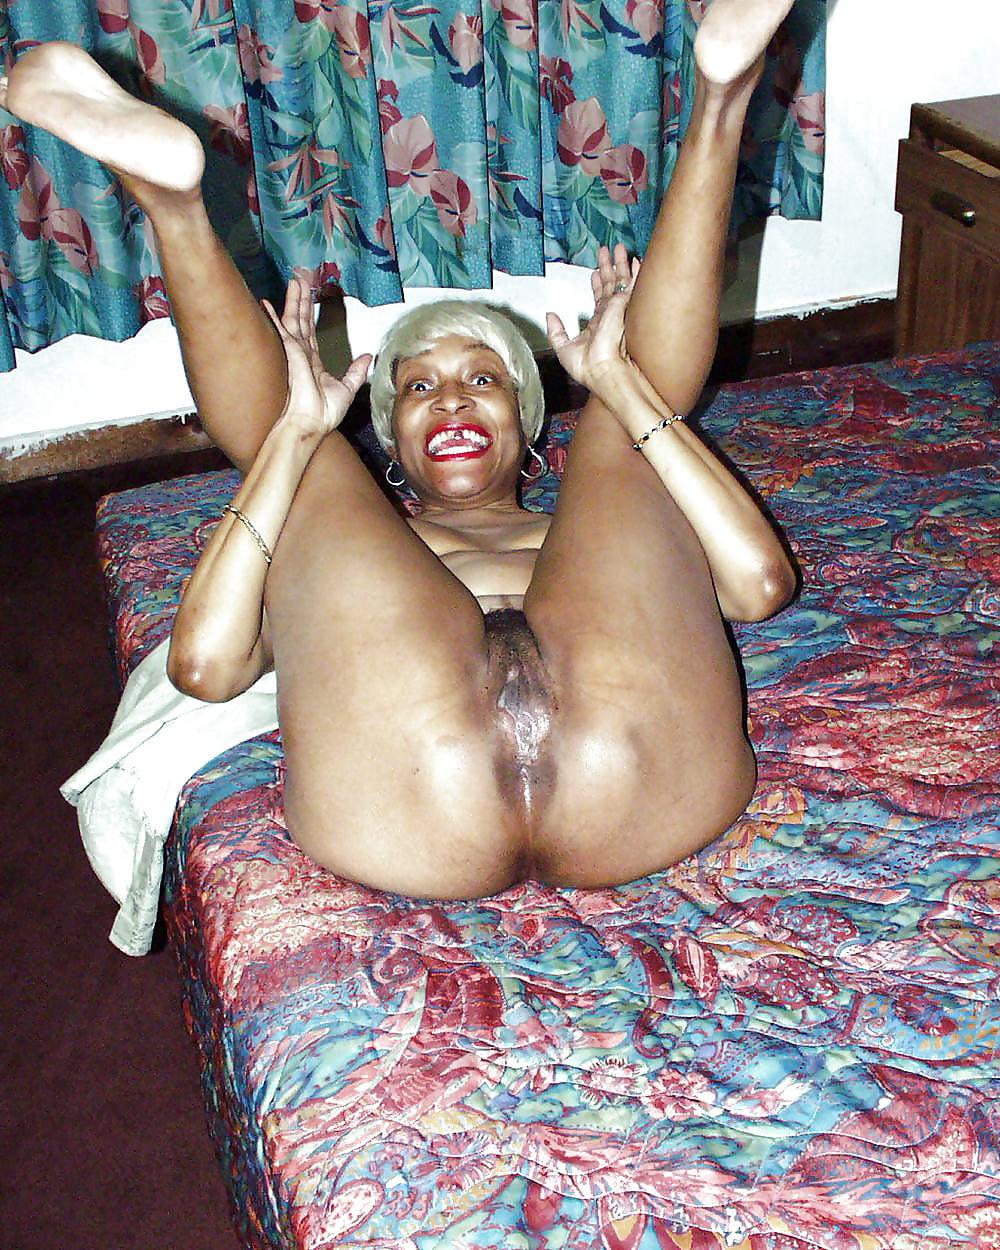 Big granny pictures pics very old black grannies